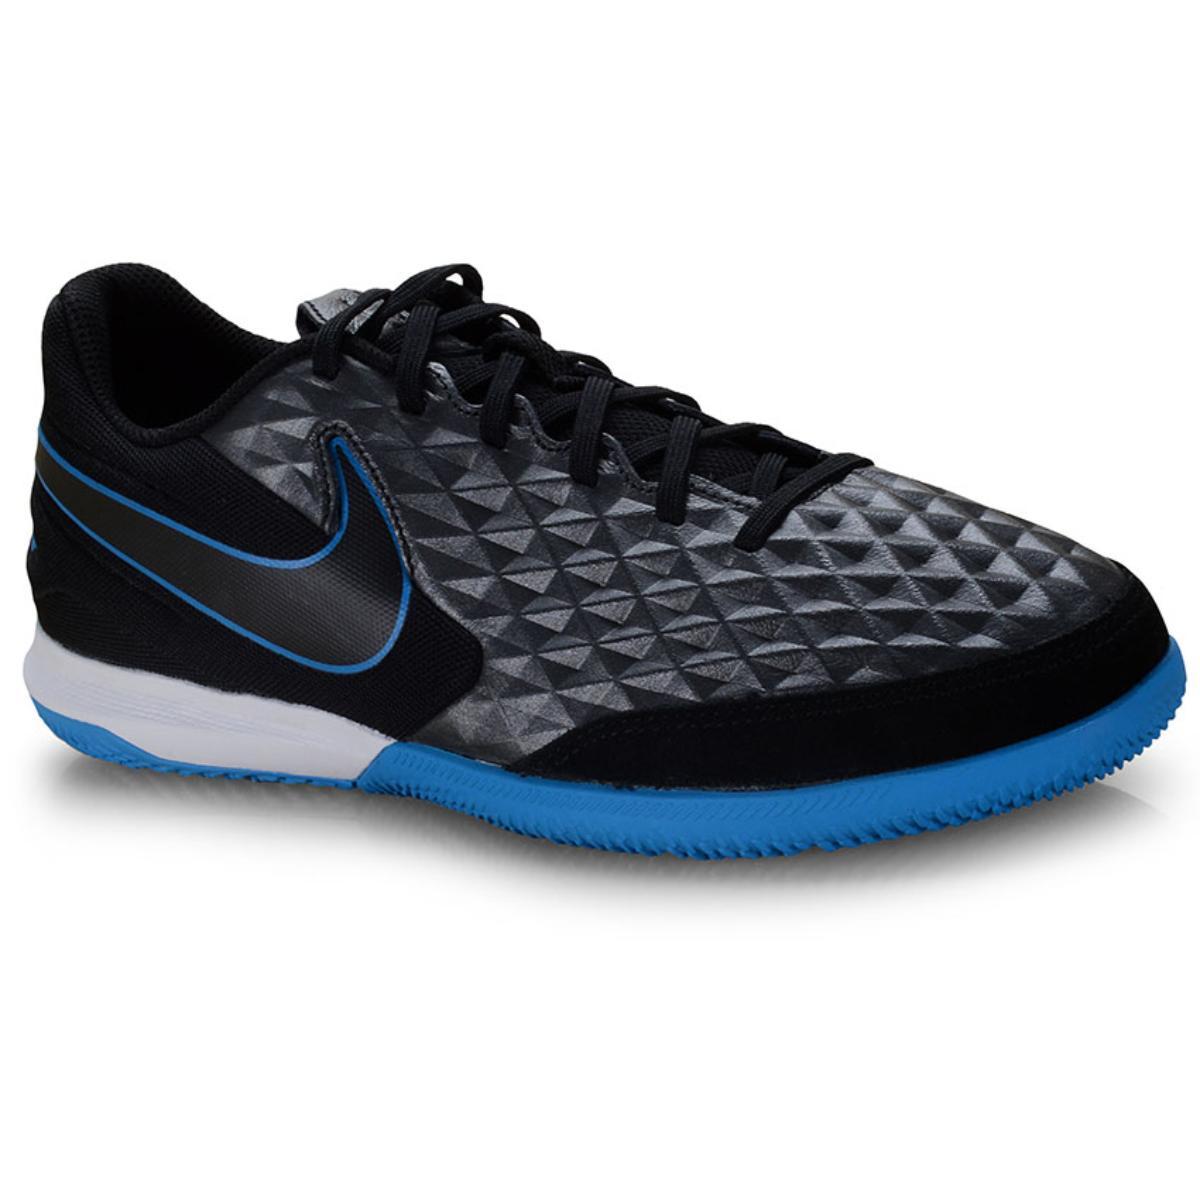 Tênis Masculino Nike At6099-004 Tiempo Legend 8 Academy ic Preto/azul